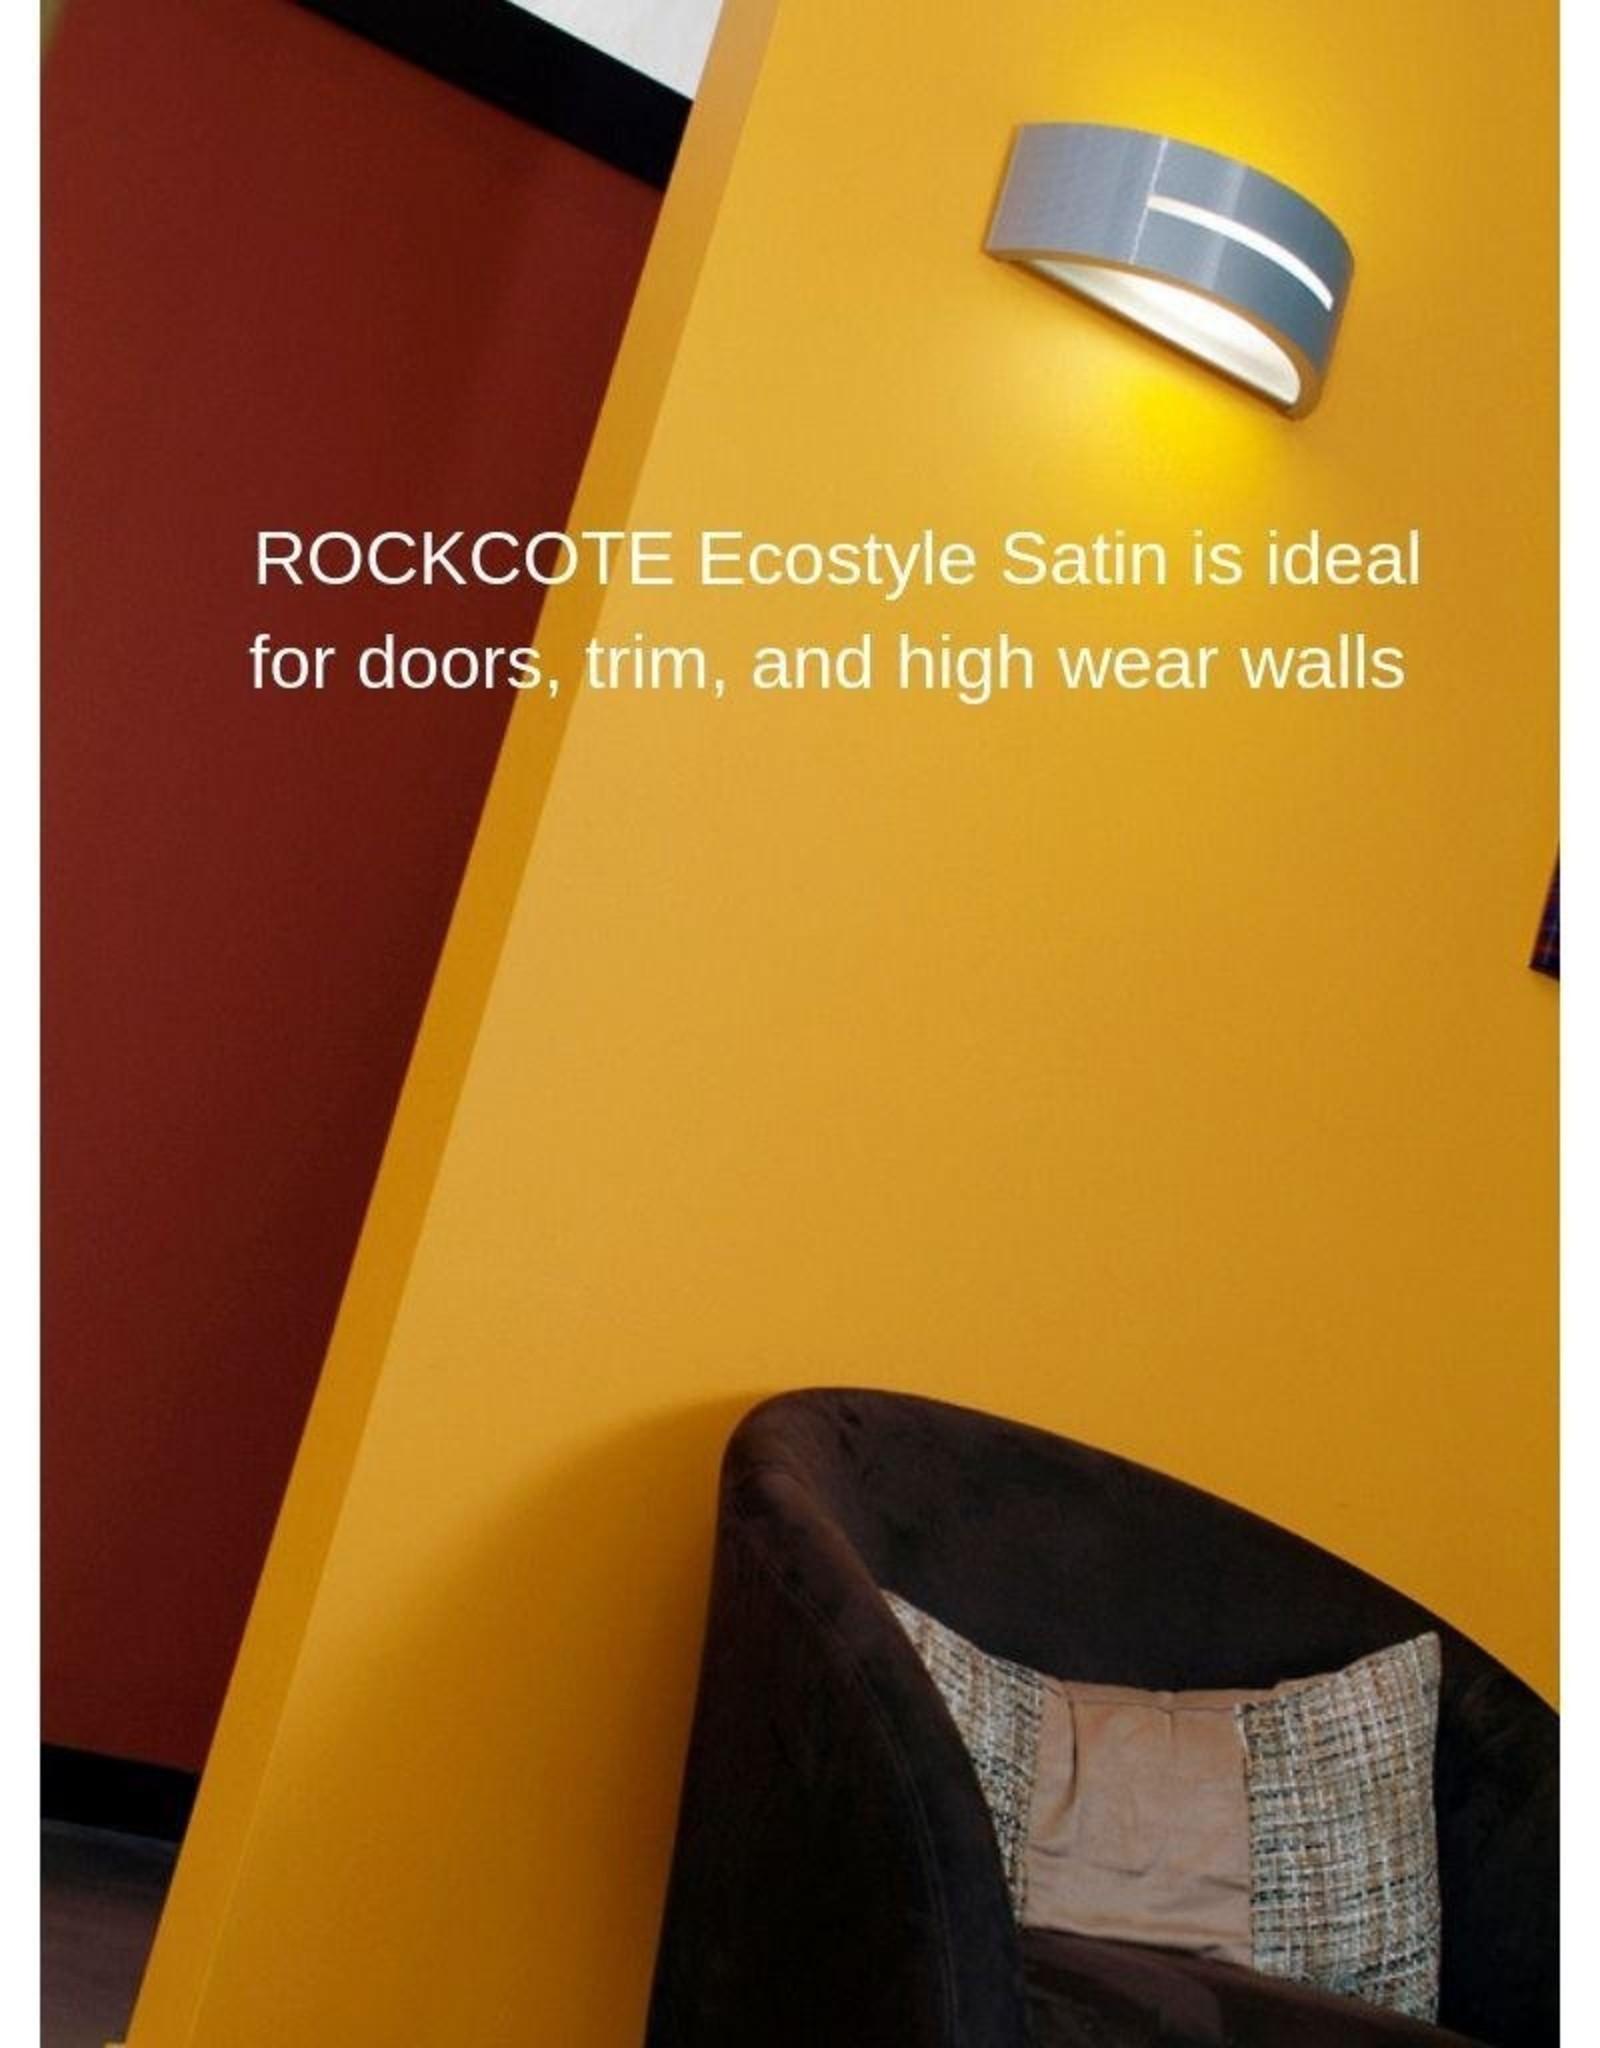 ROCKCOTE Ecostyle Satin